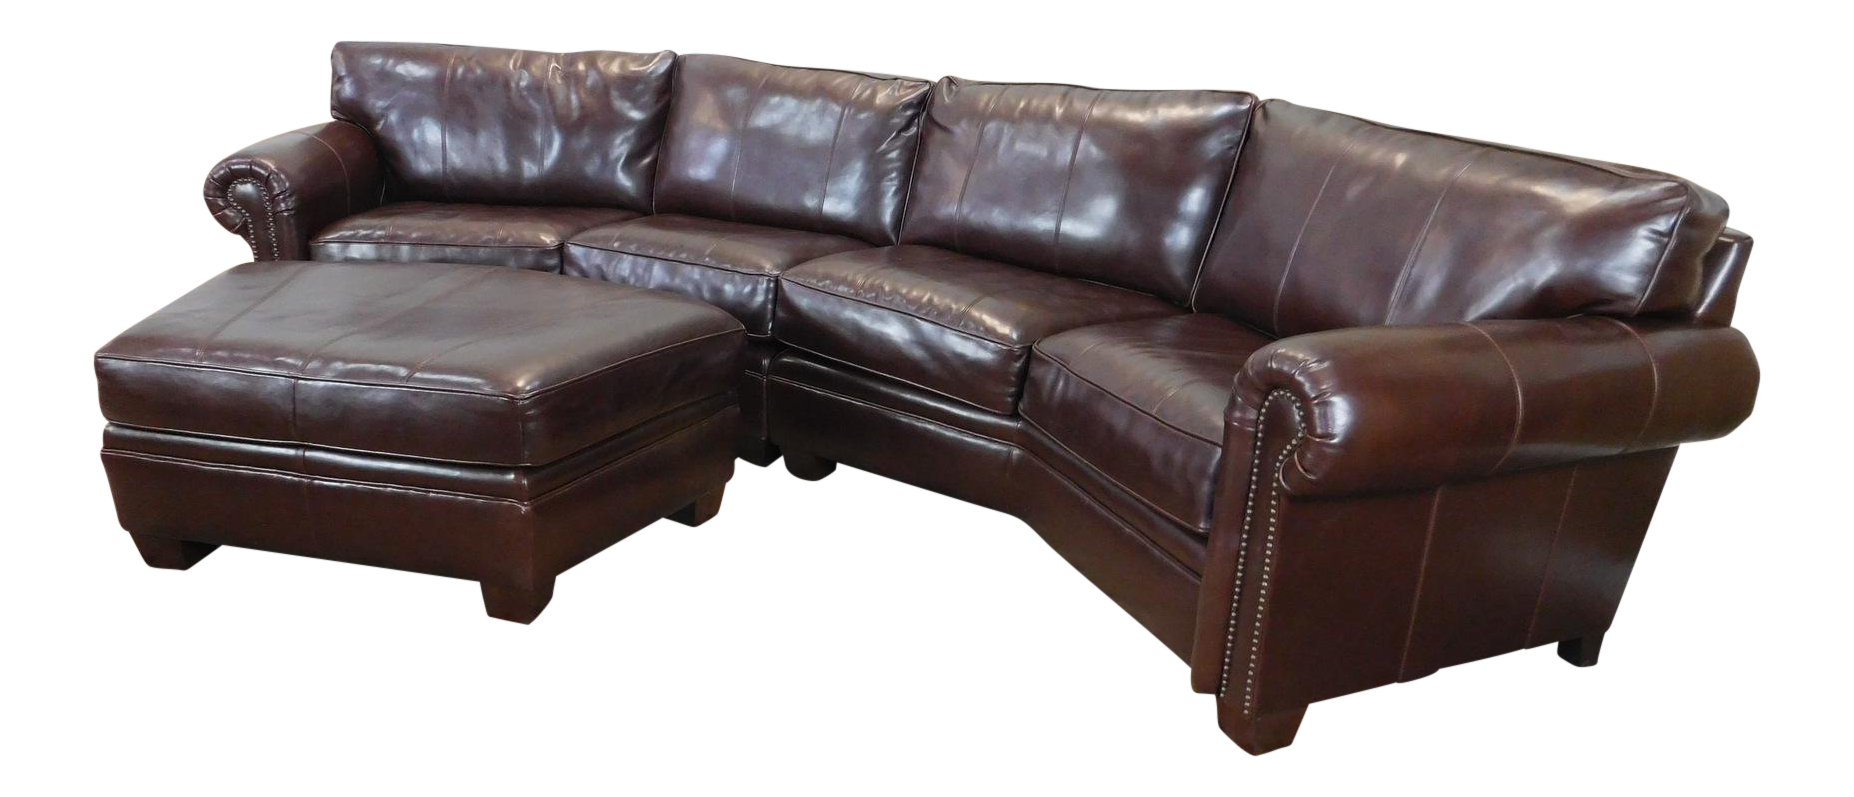 3 Piece Bernhardt Brown Leather Sectional Sofa Amp Ottoman